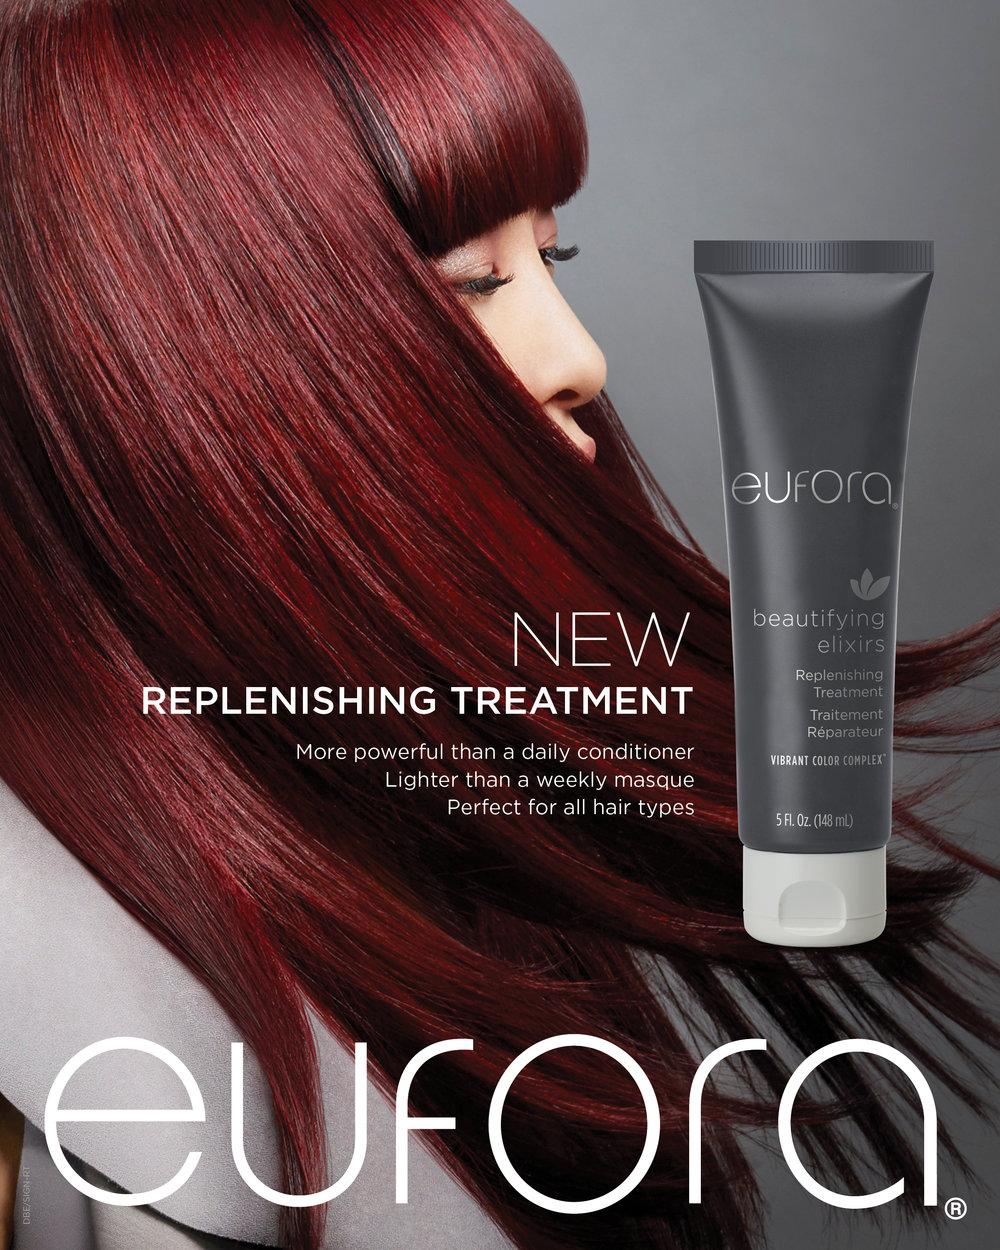 spring-replenishing-treatment-hair-salon-maple-grove.jpg